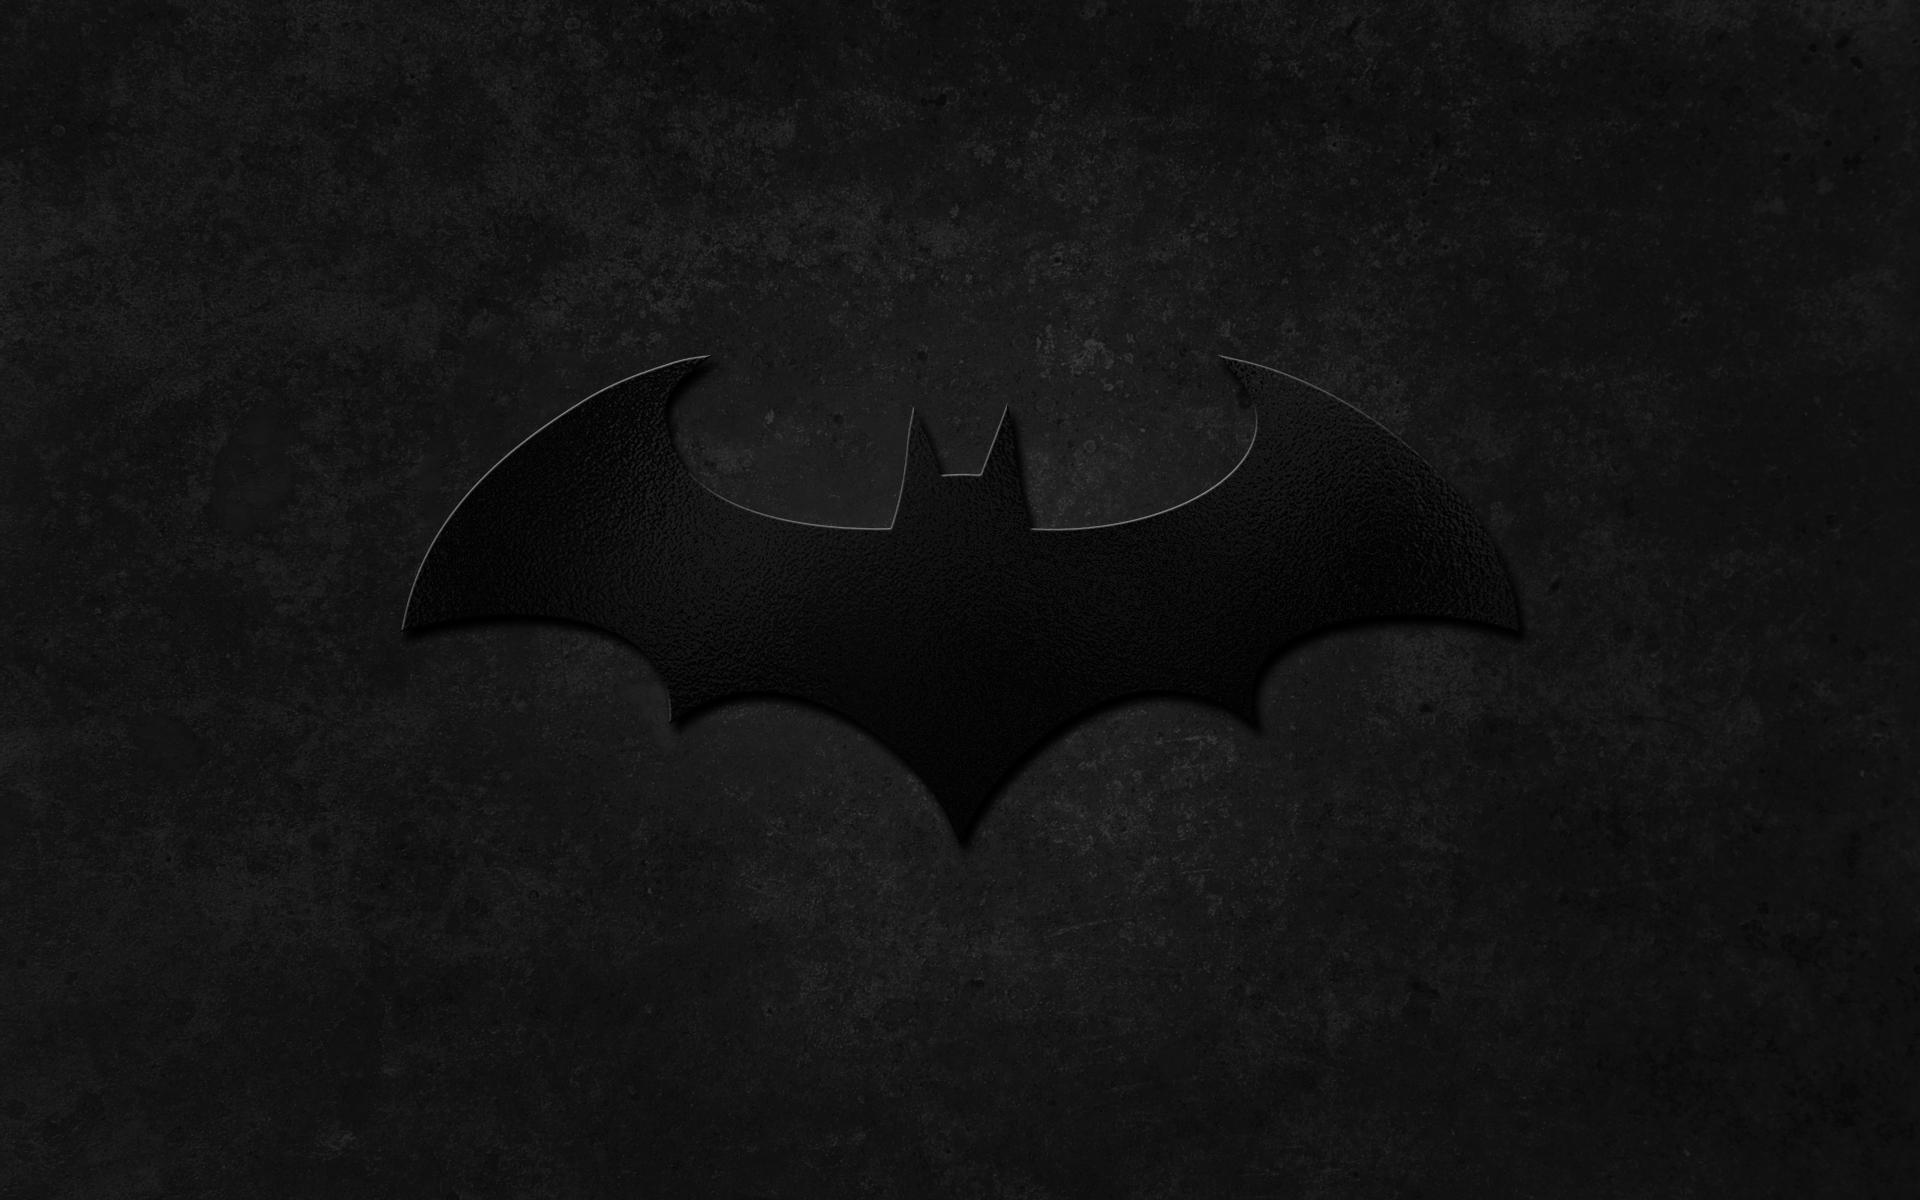 49 Batman Emblem Wallpaper On Wallpapersafari